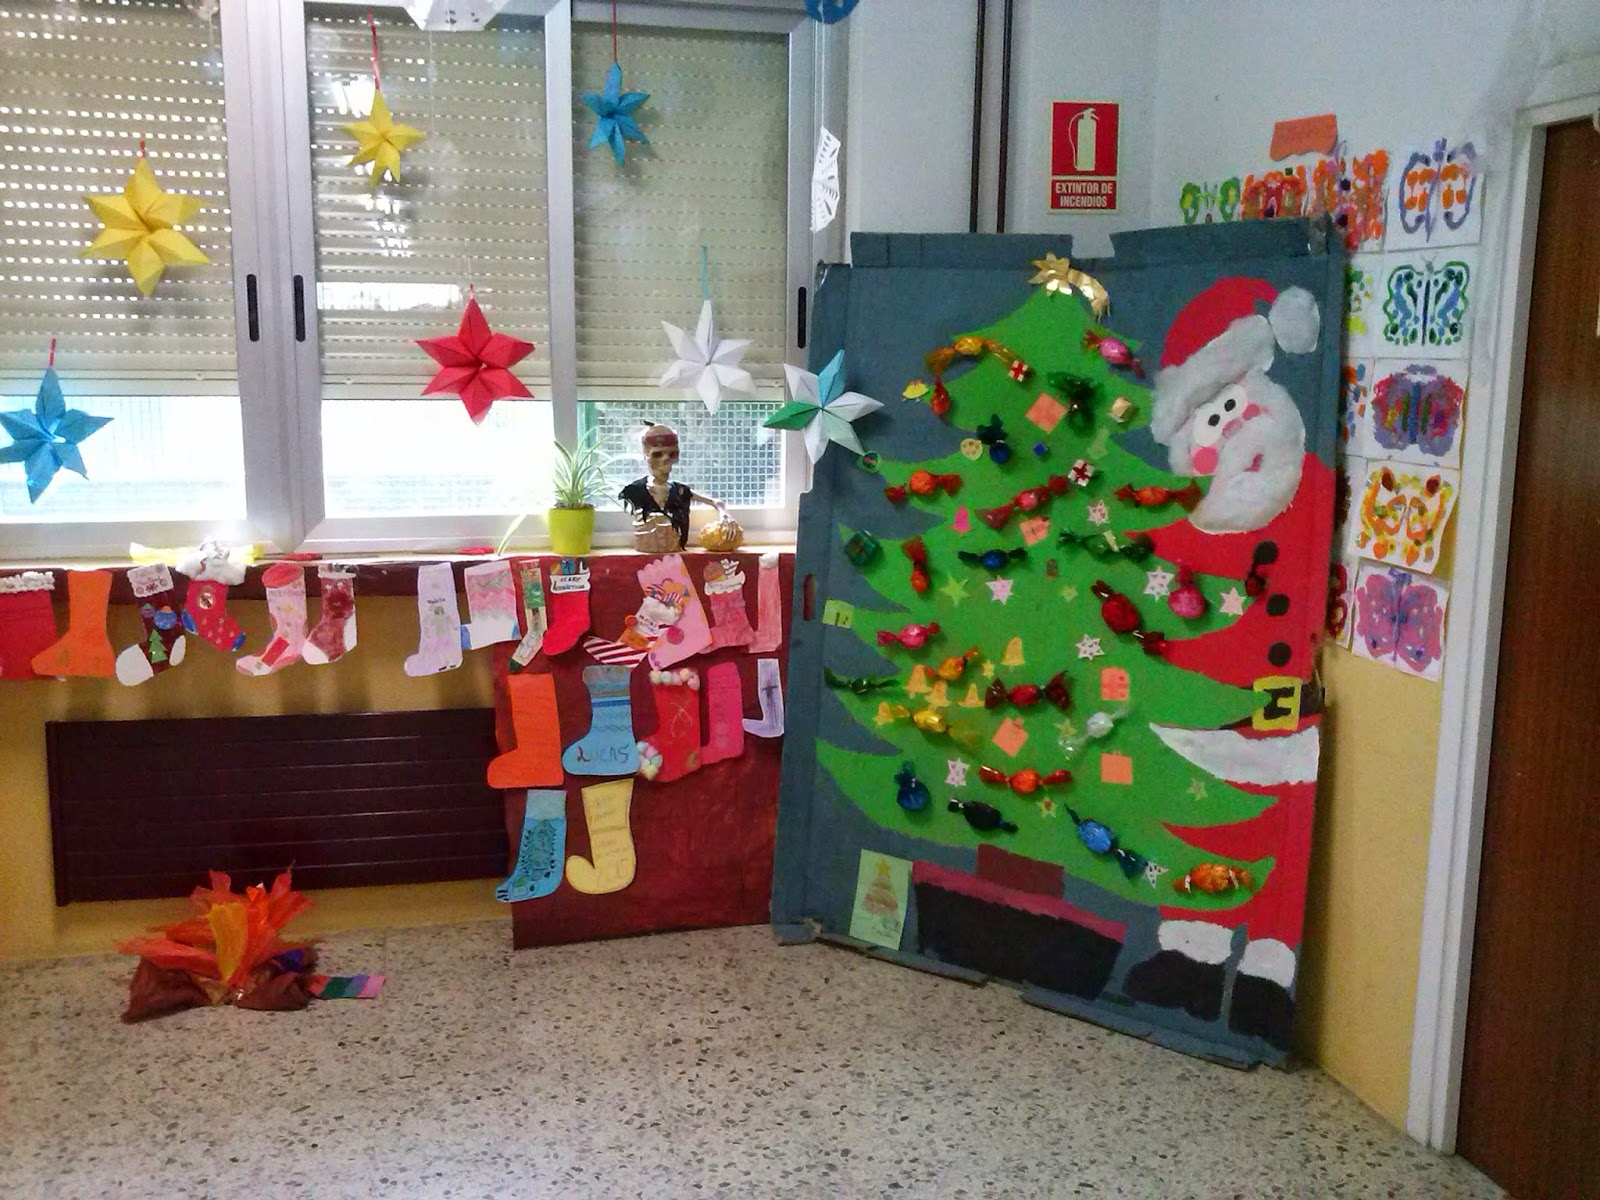 Infantil aula 3 a os decoraci n navide a colegio - Decoracion navidena infantil ...